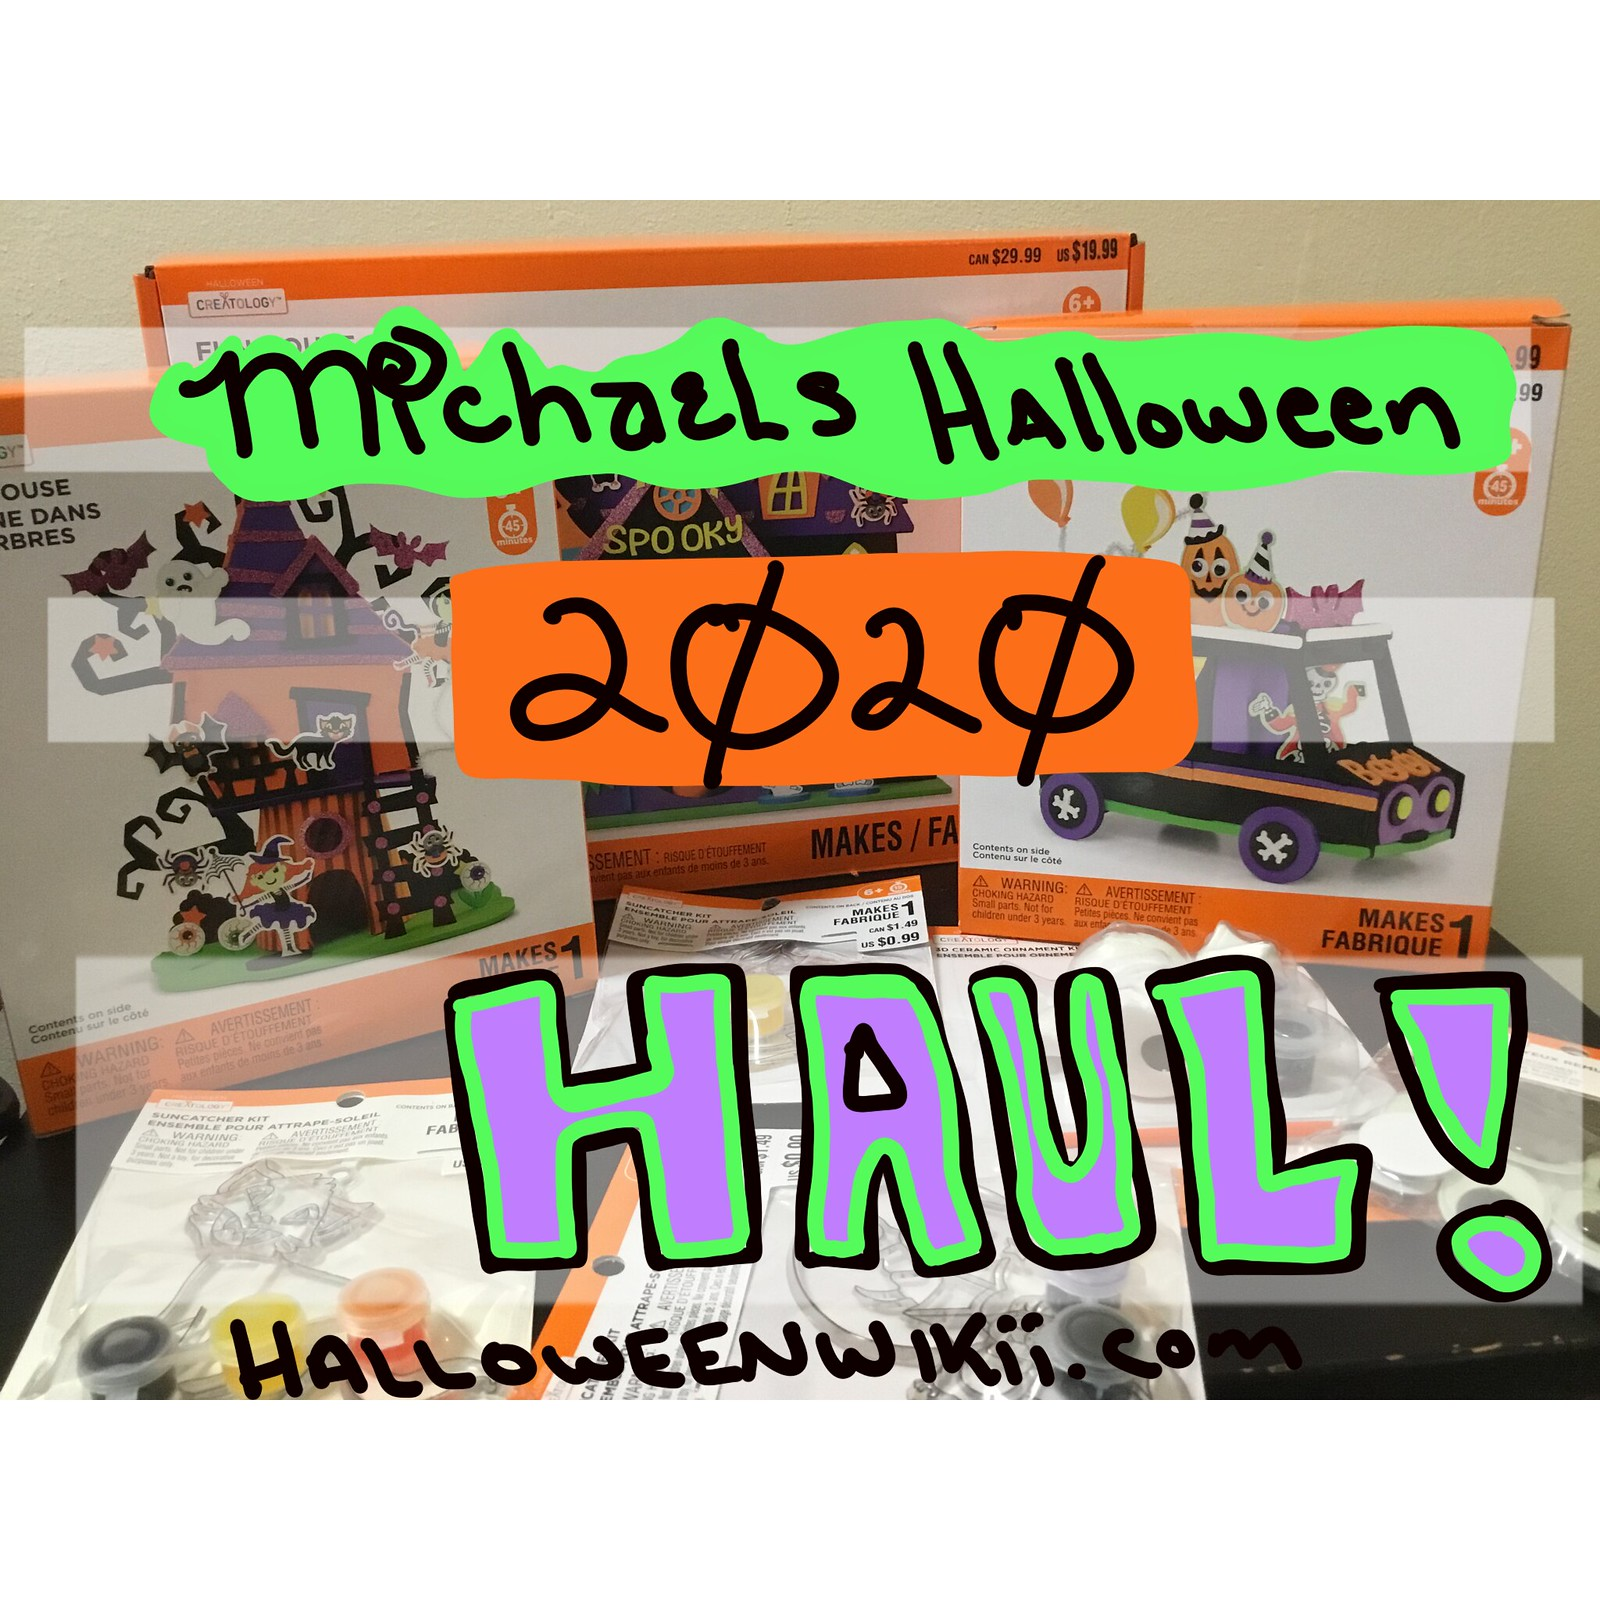 Michaels Halloween Kids Crafts Haul 2020